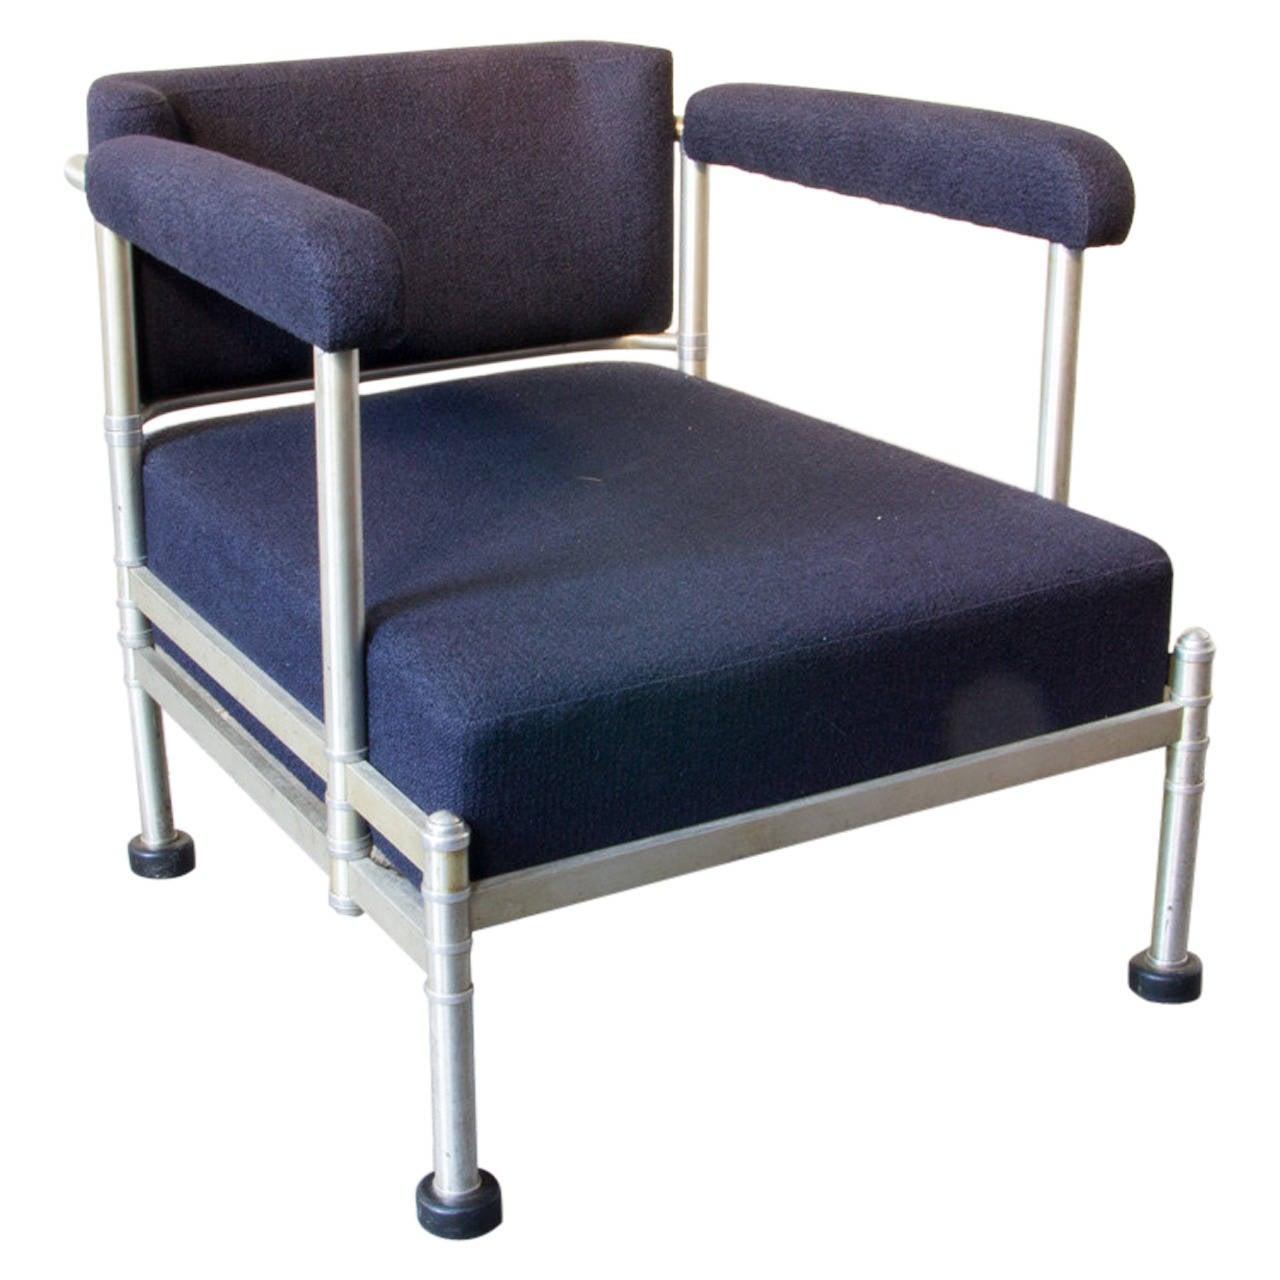 classic pair of art deco machine age aluminium lounge chairs by